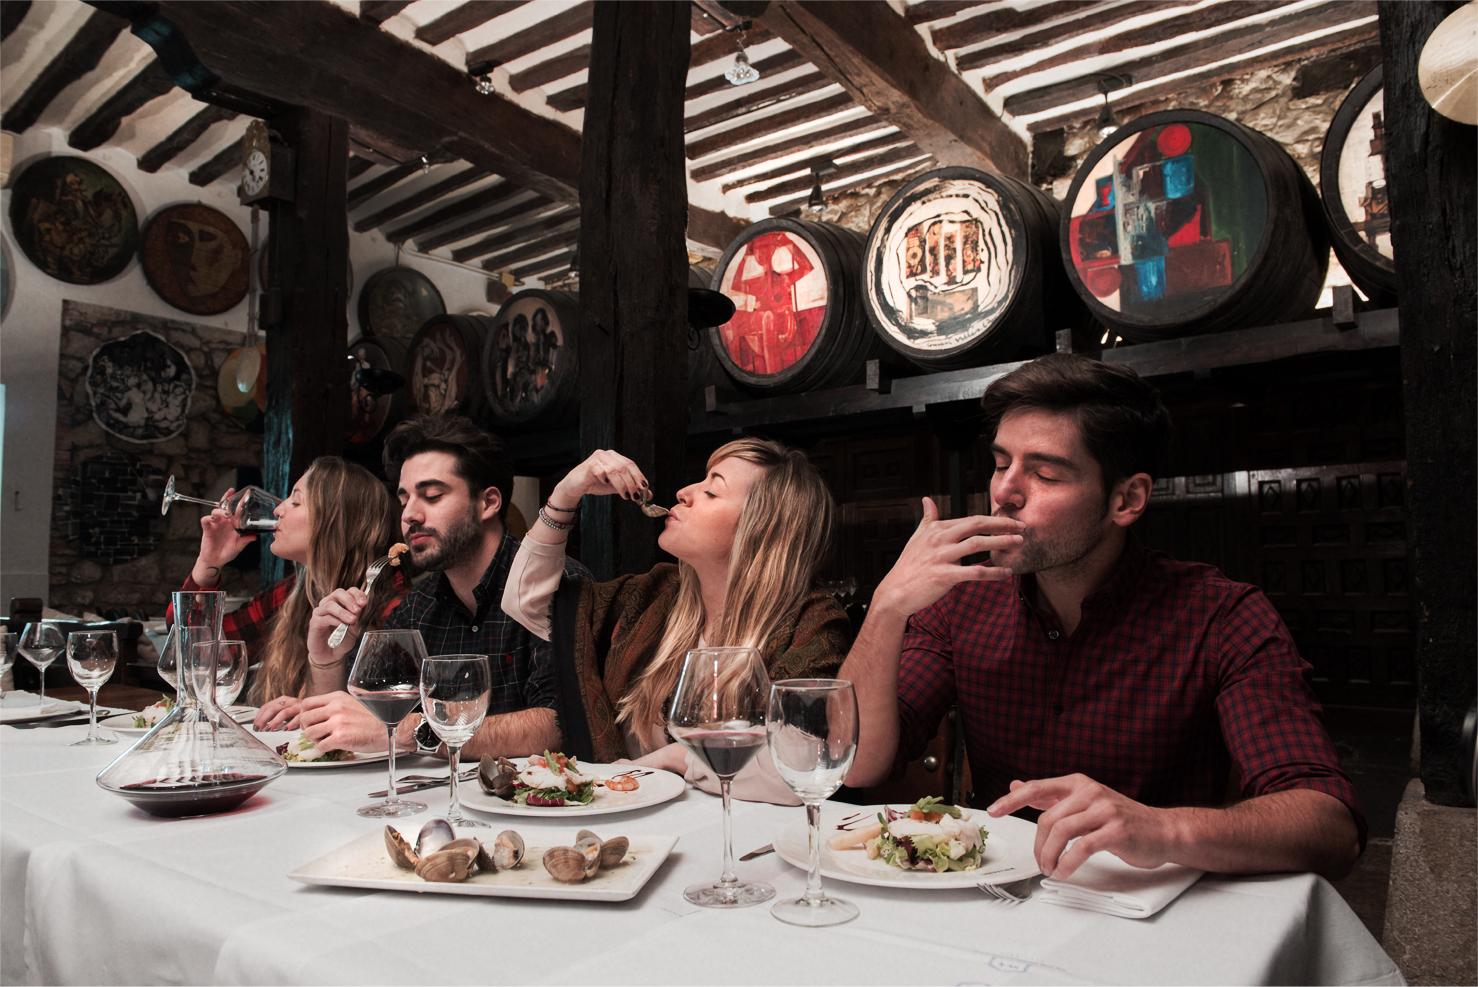 Gastronomia/Gastronomy :: Cantabria, Spain - Cover